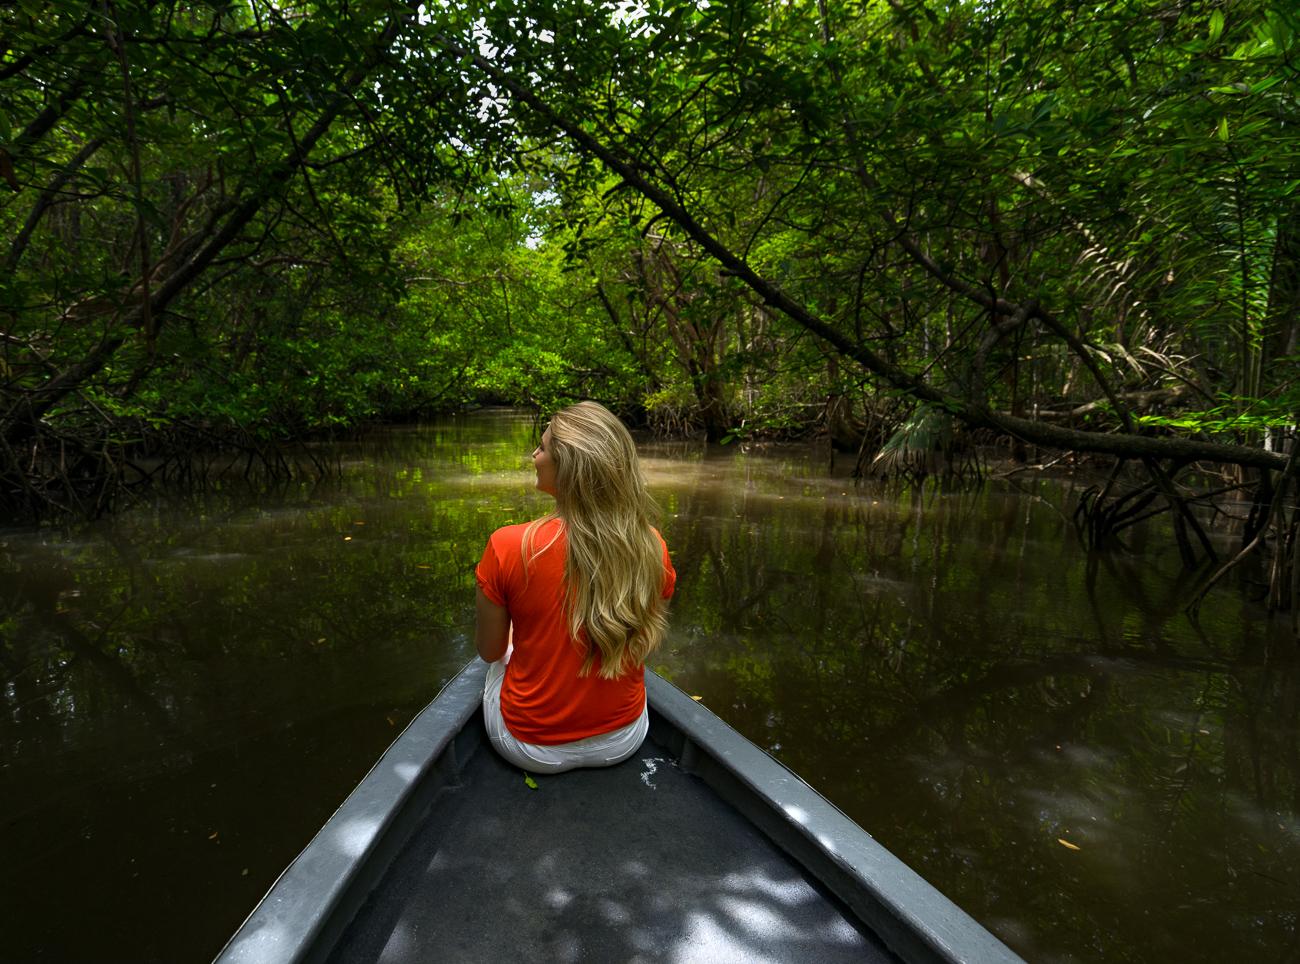 Bintan Mangrove, Hutan Bakau Memukau di Pulau Bintan - Mister Aladin Travel  Discoveries